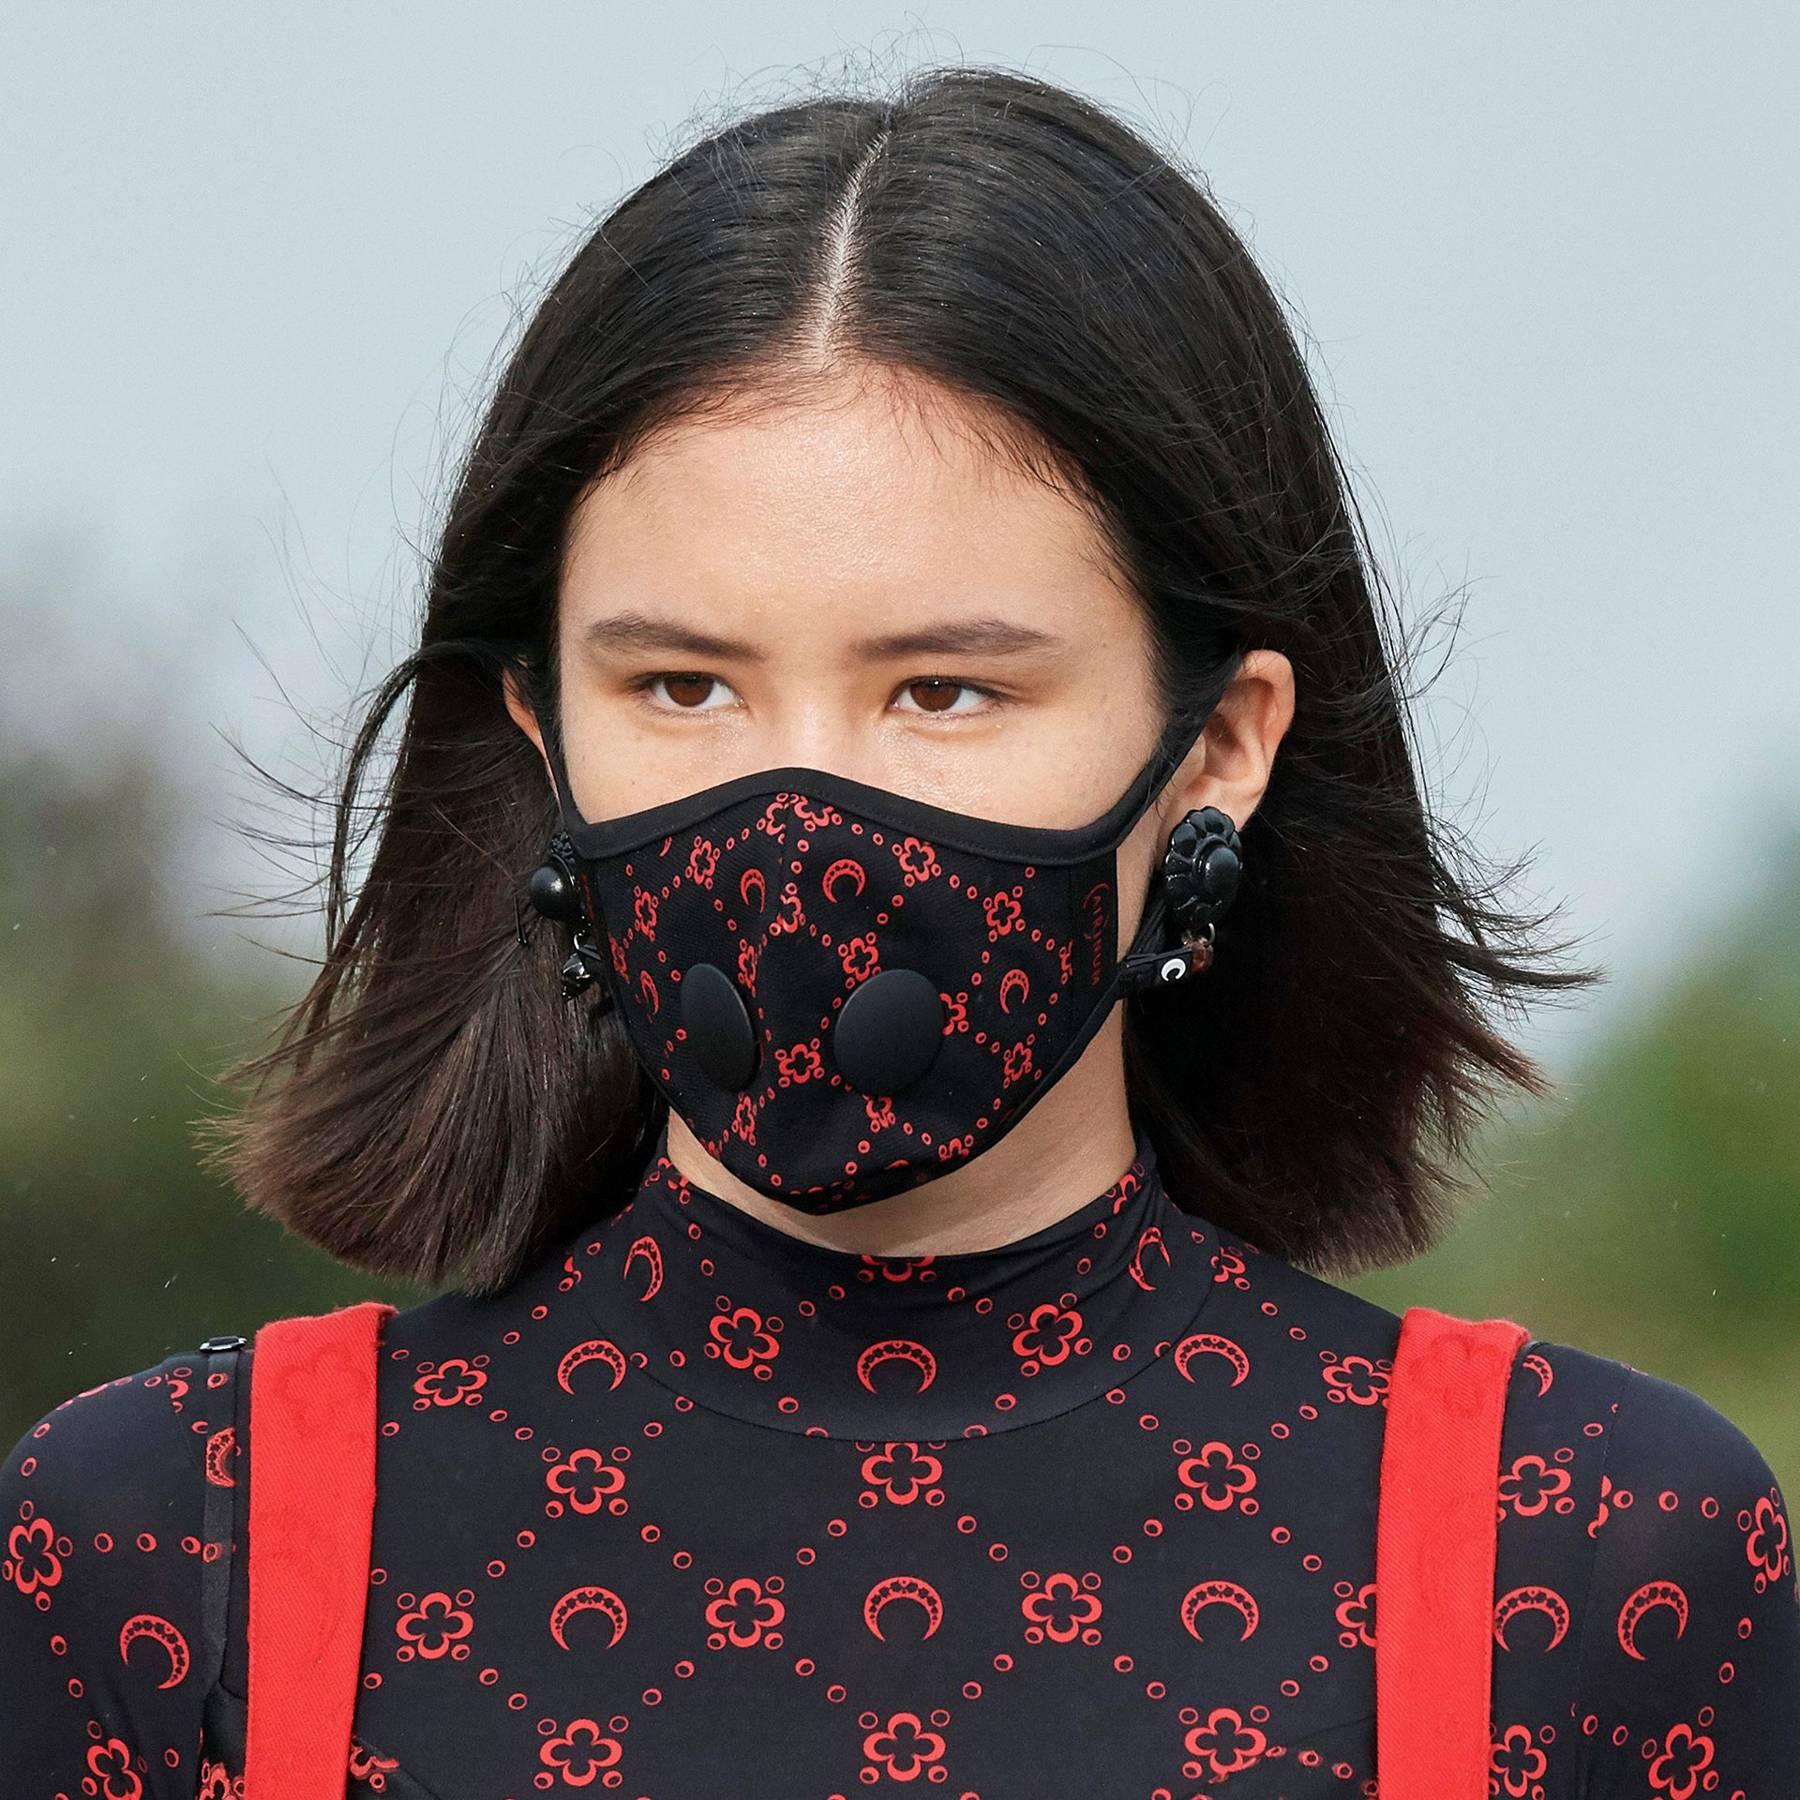 Gucci Mask fashion clothing face mask